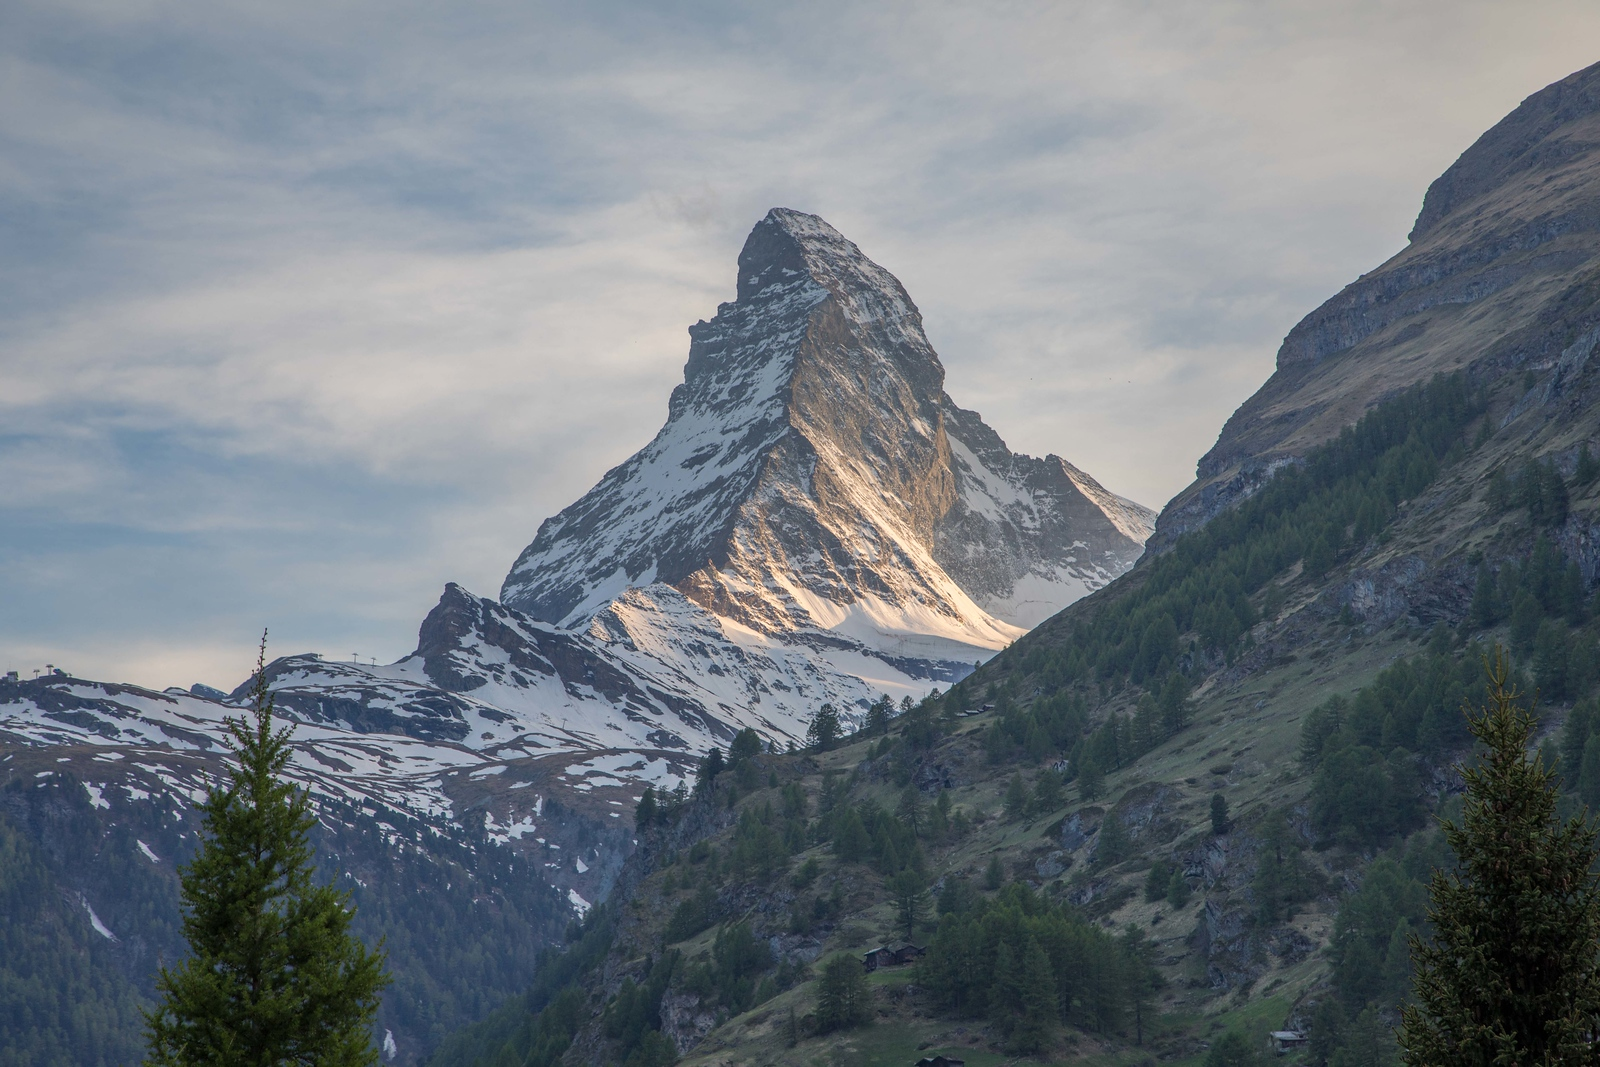 View of The Matterhorn from hotel in Zermatt